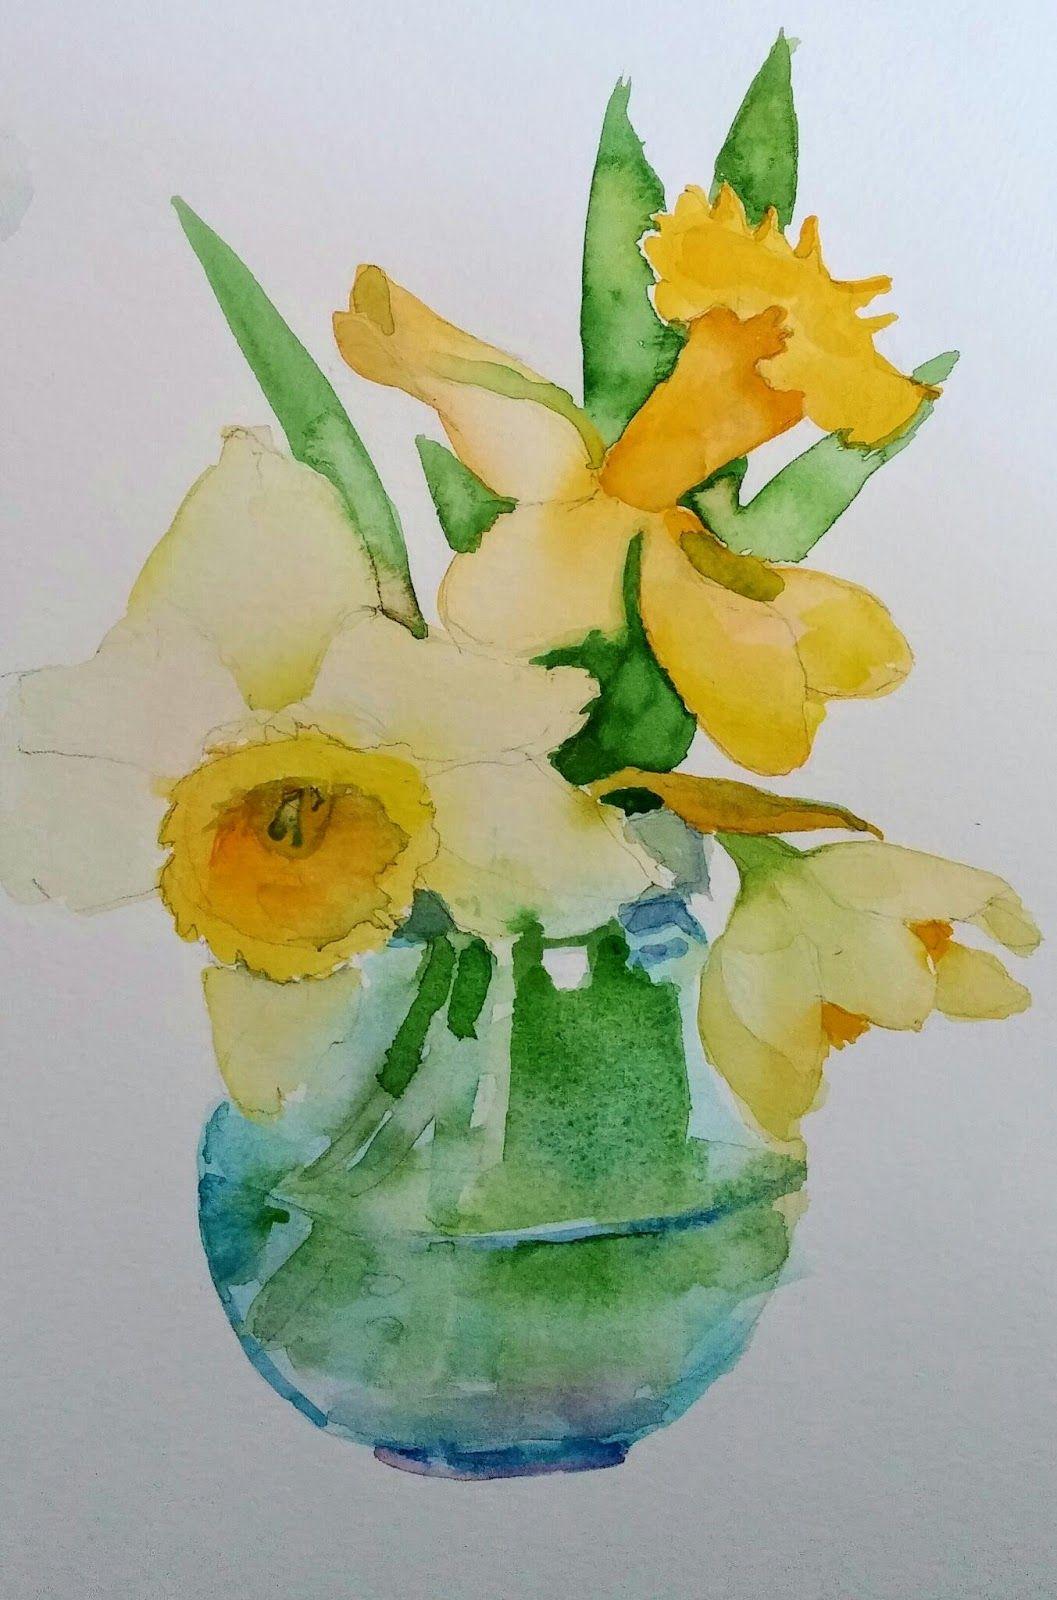 Daffodils En 2020 Aquarelle Fleurs Aquarelle Jonquille